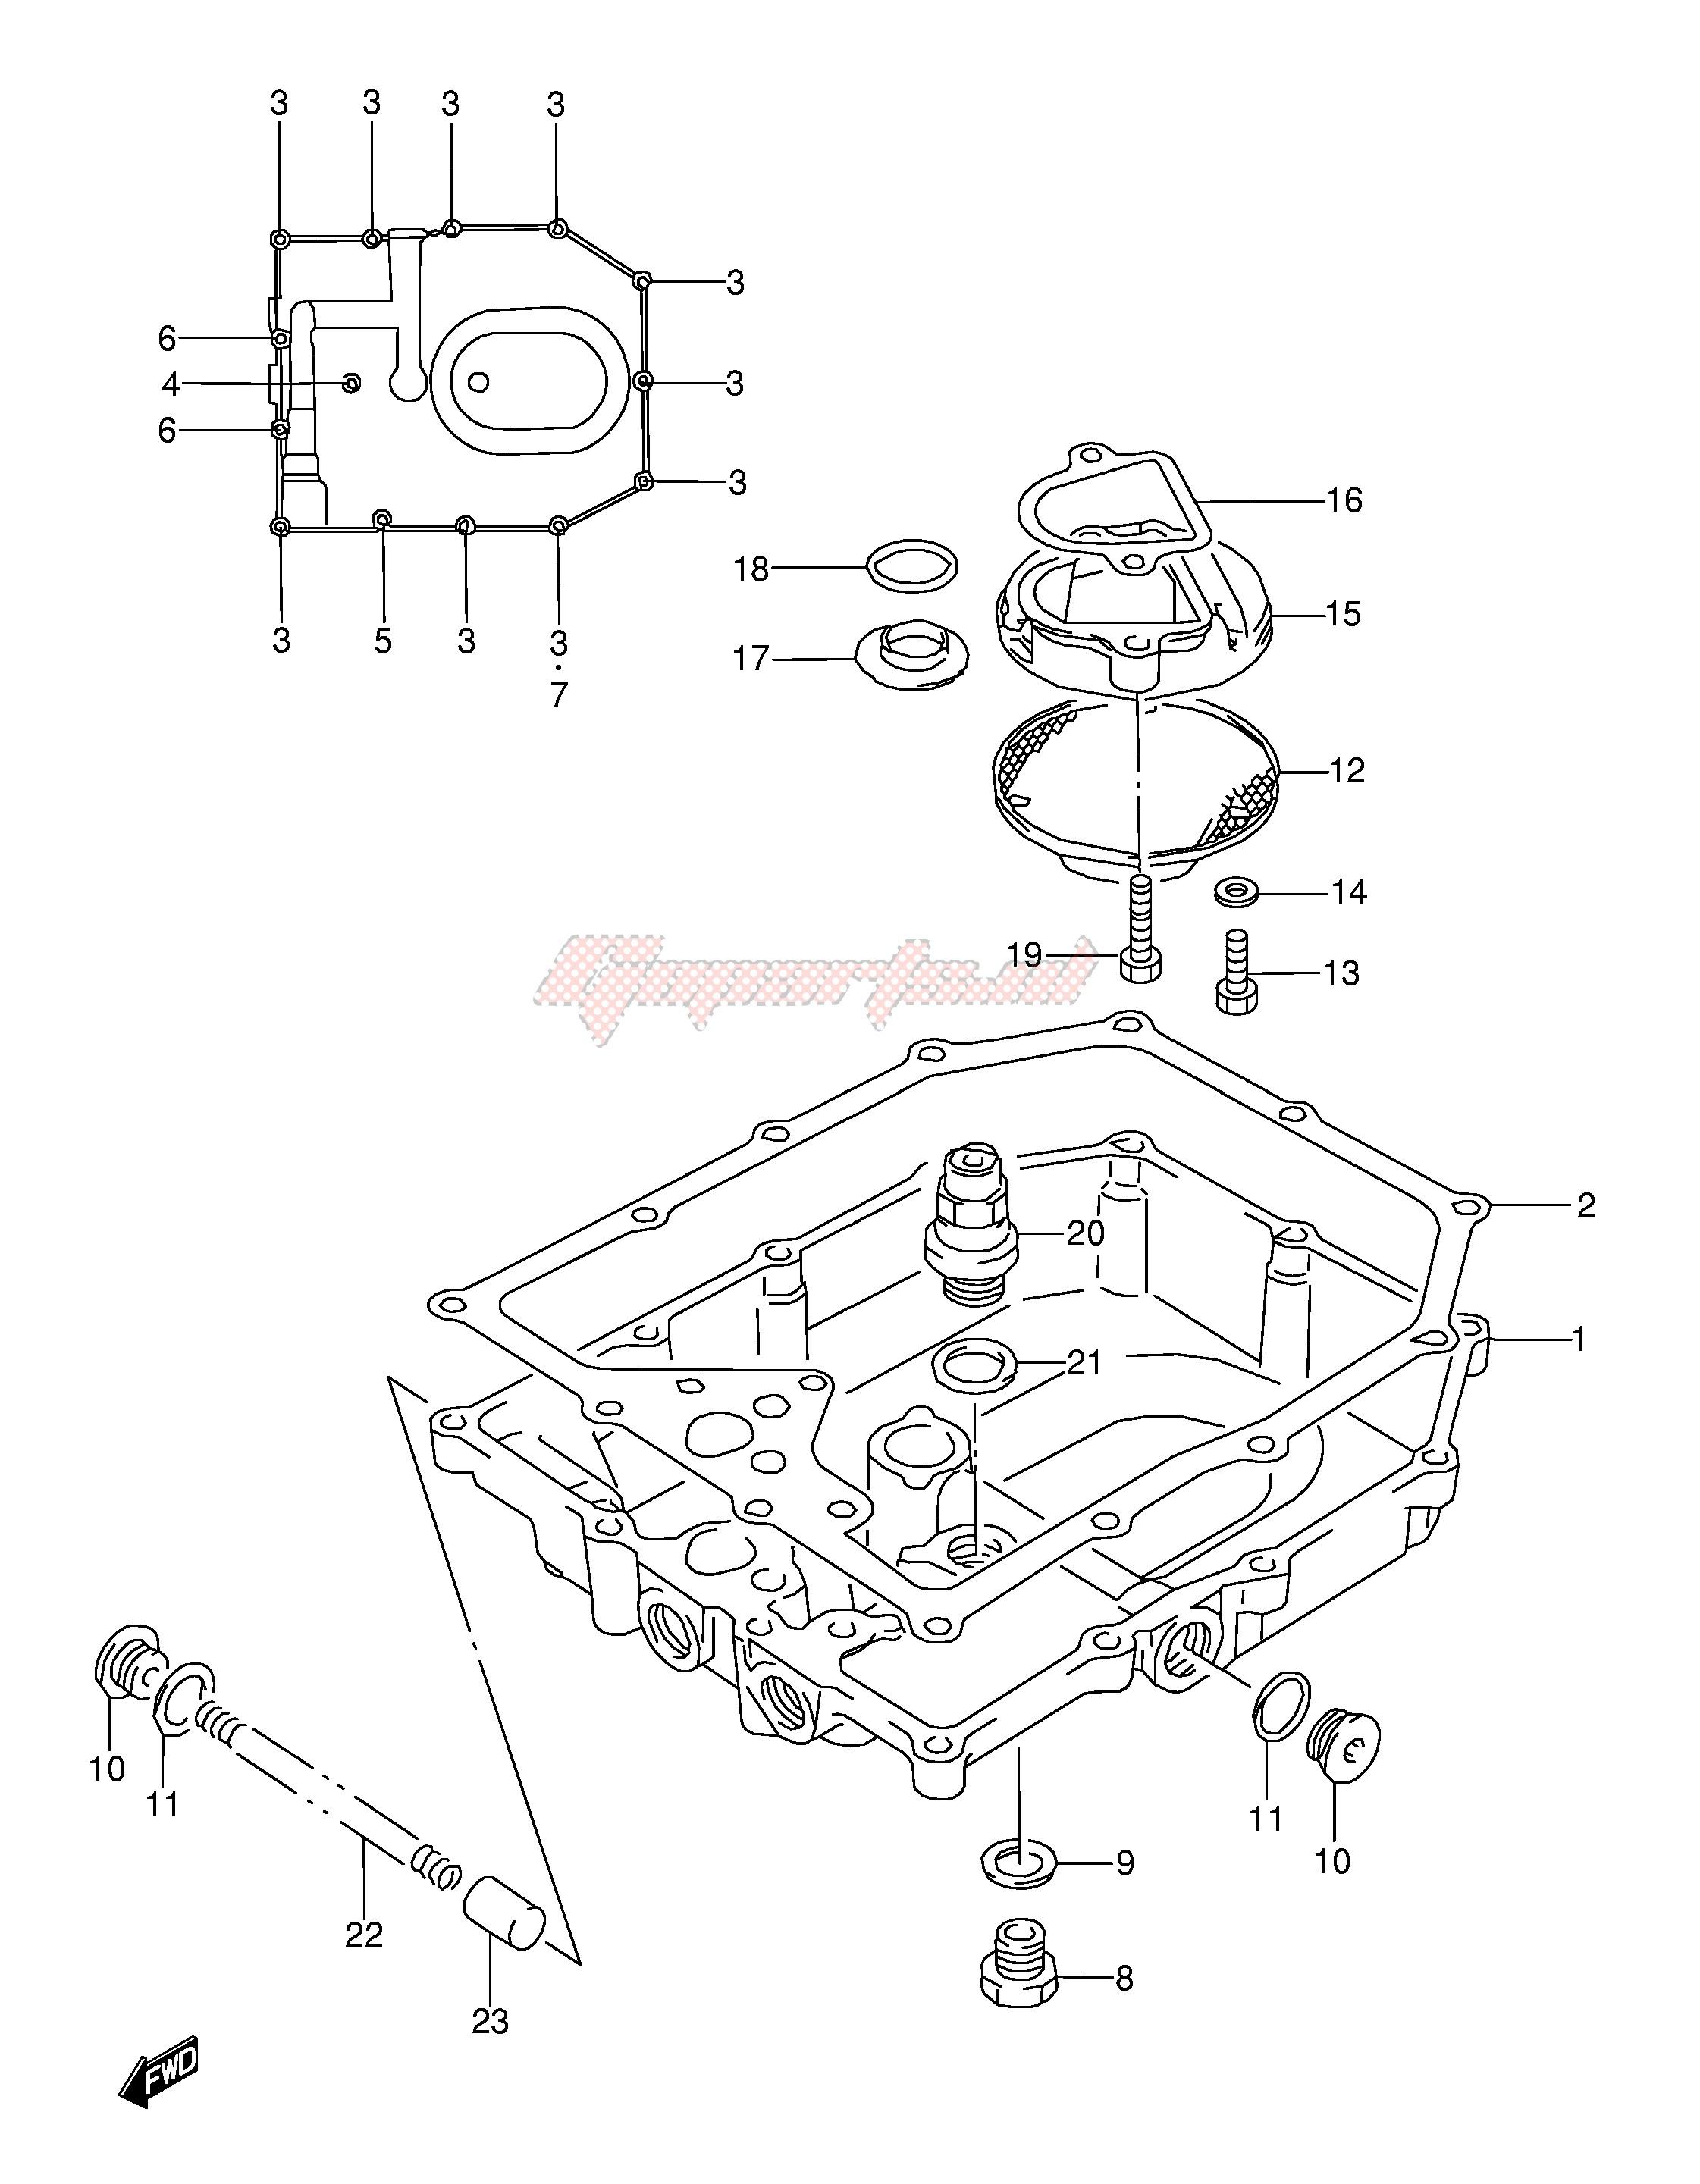 Suzuki 09280-18009 O Ring QTY 1